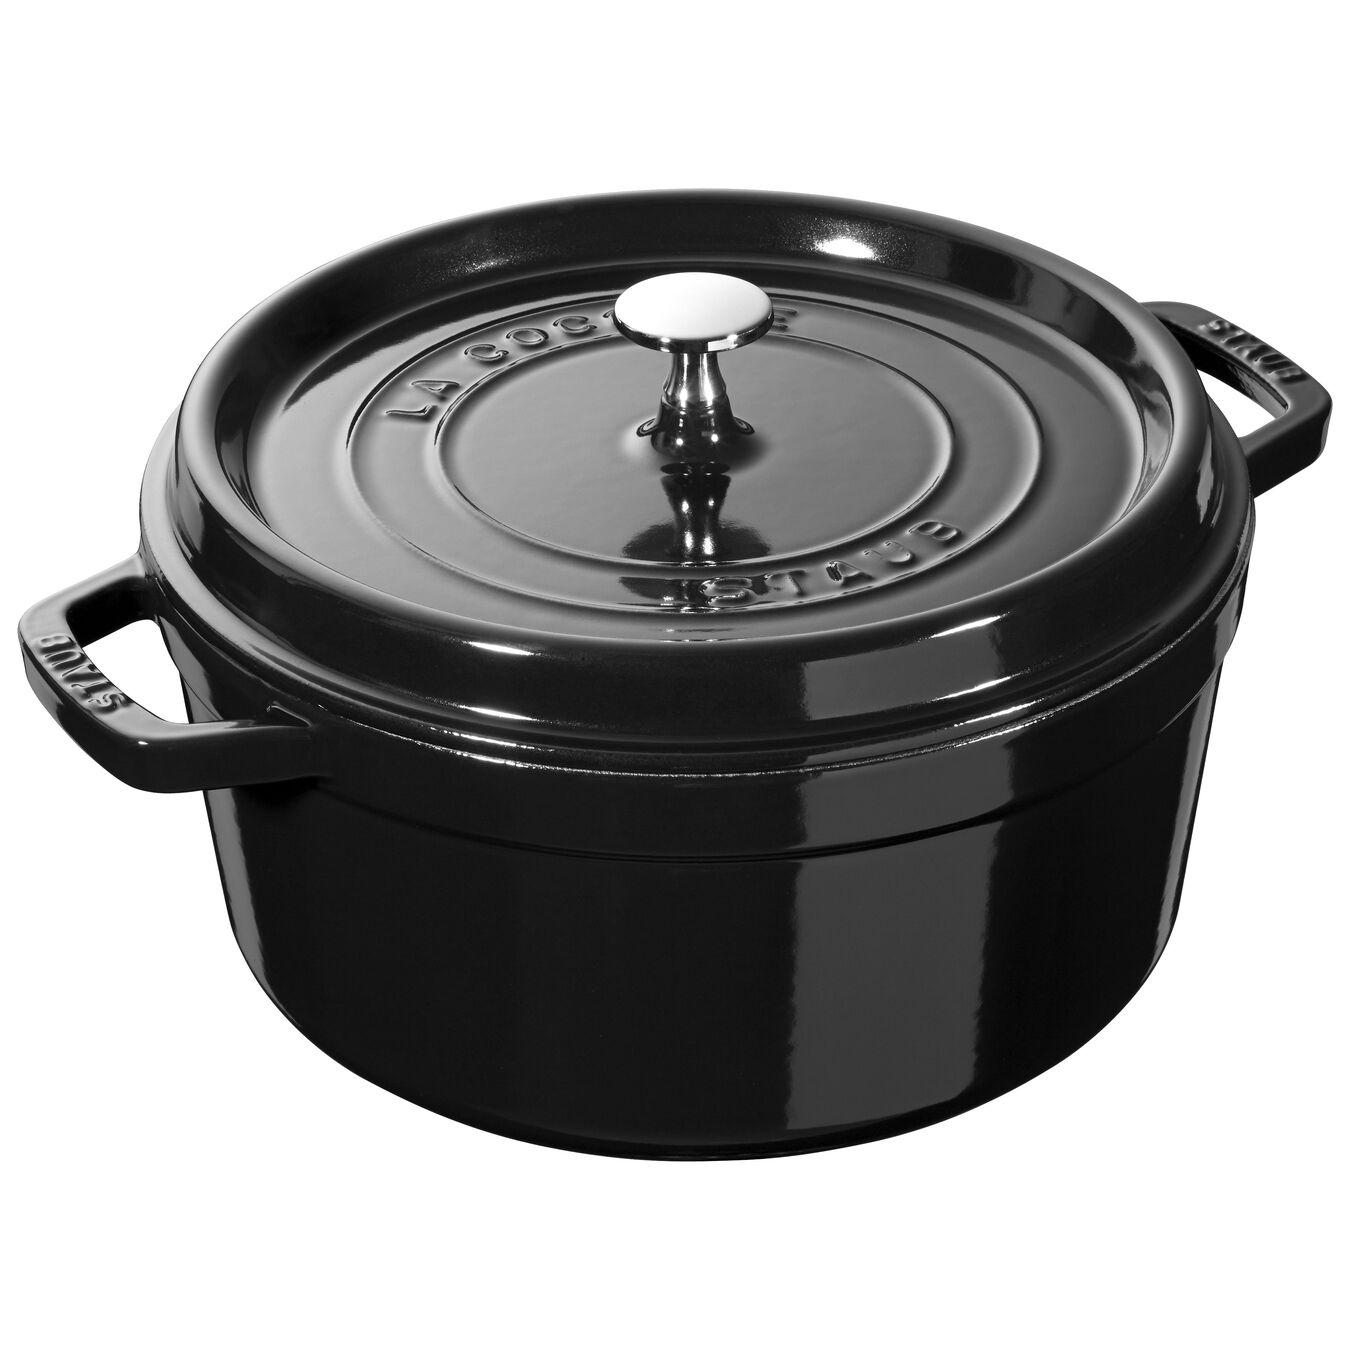 3.75 l Cast iron round Cocotte, Shiny-Black,,large 1